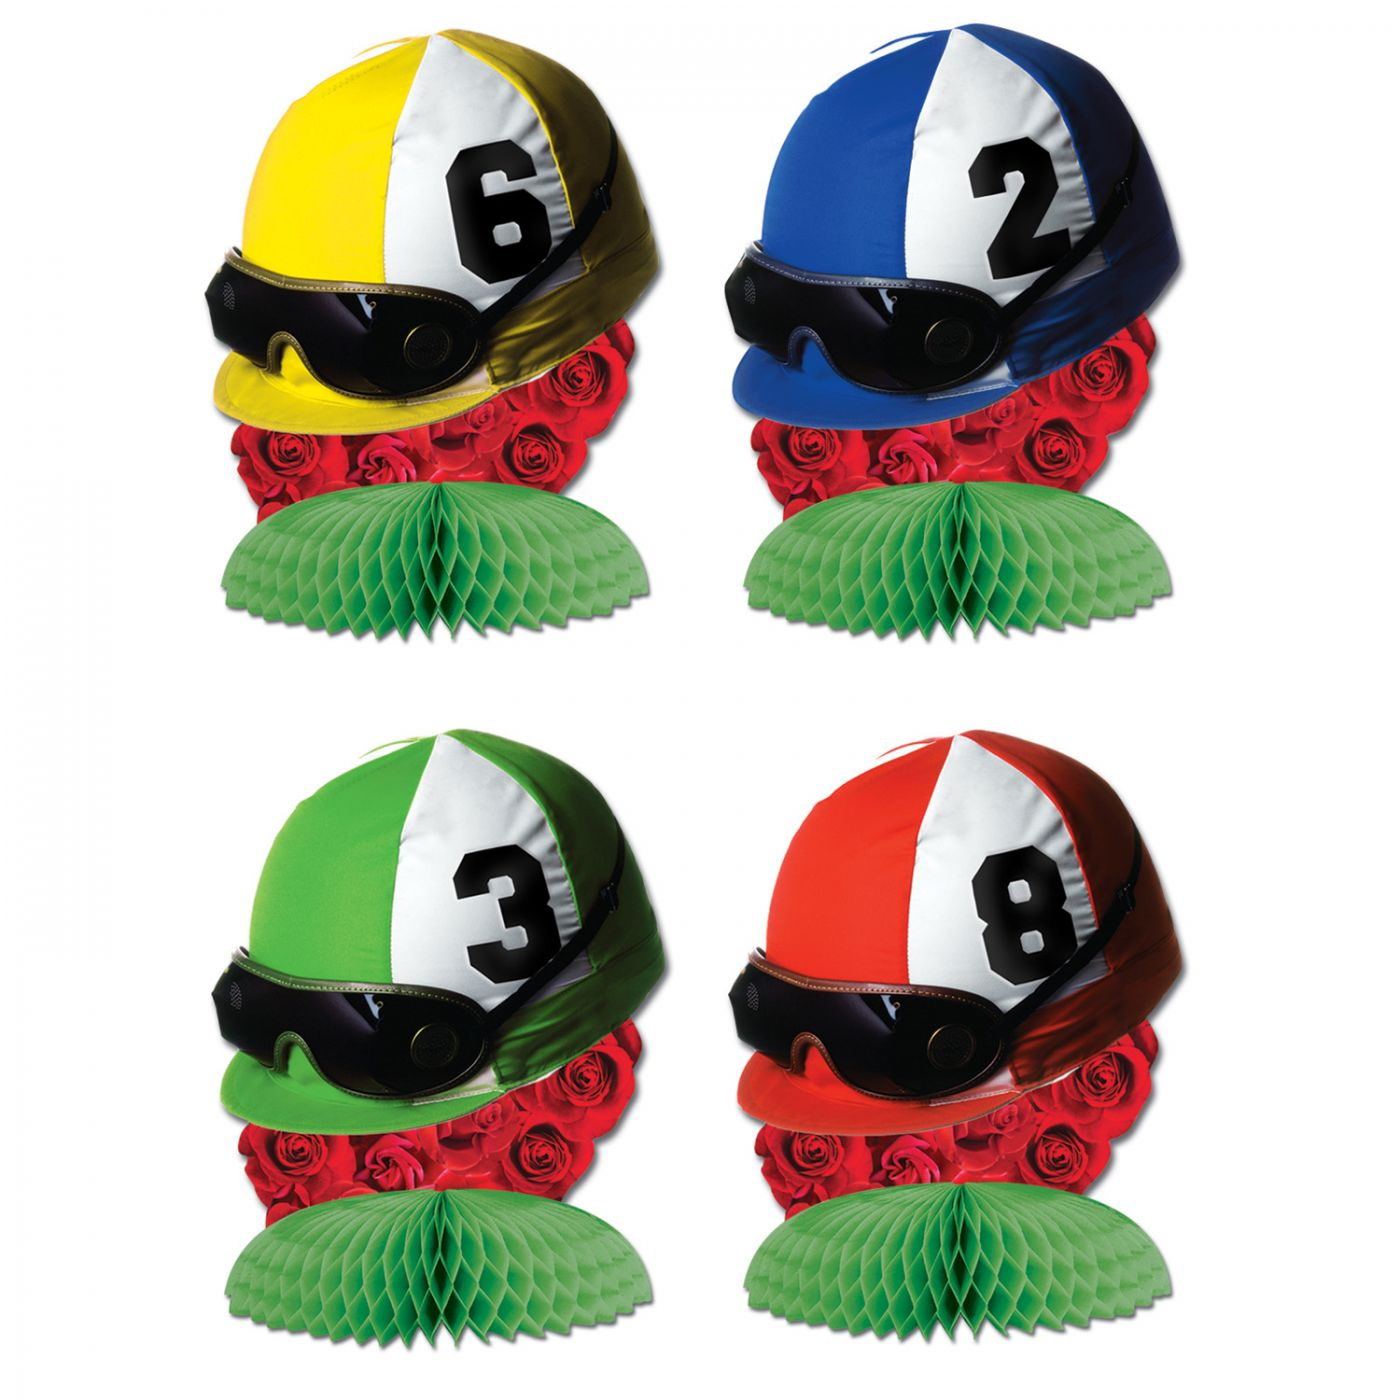 Jockey Helmet Centerpieces image